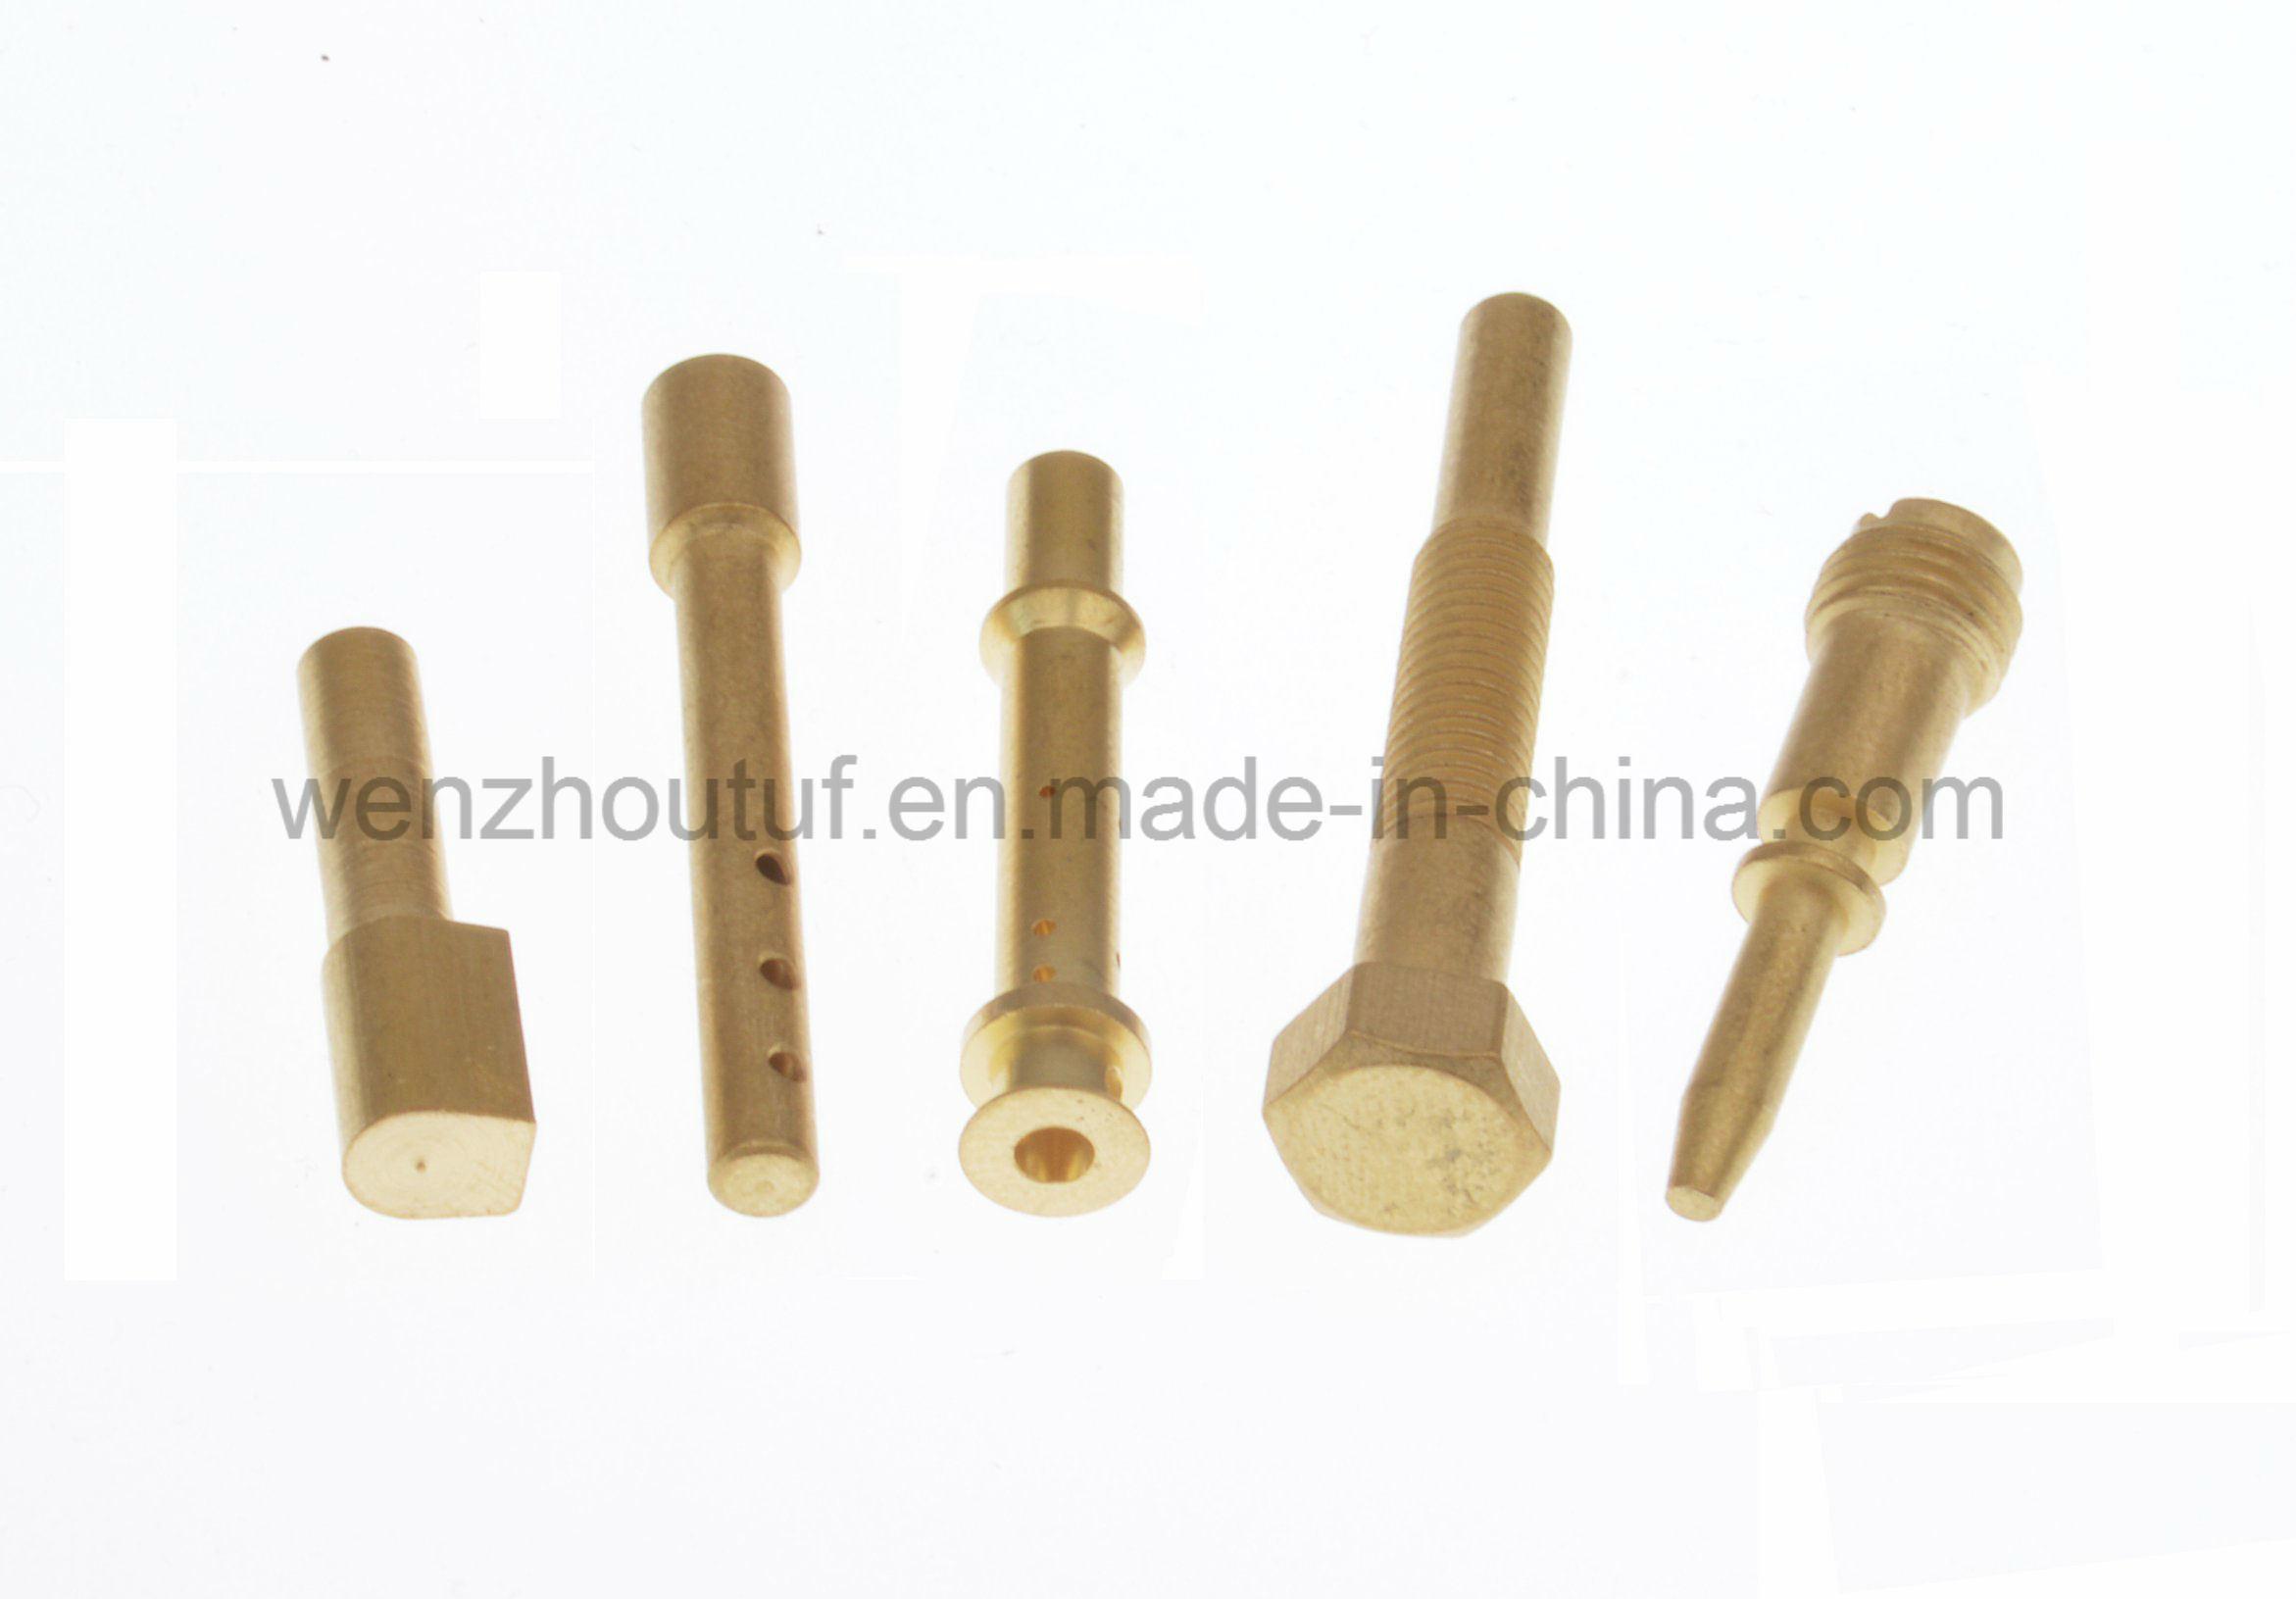 Precision Spade Copper Terminal Copper Terminals Copper Lug Copper Terminal for Electrical Meter